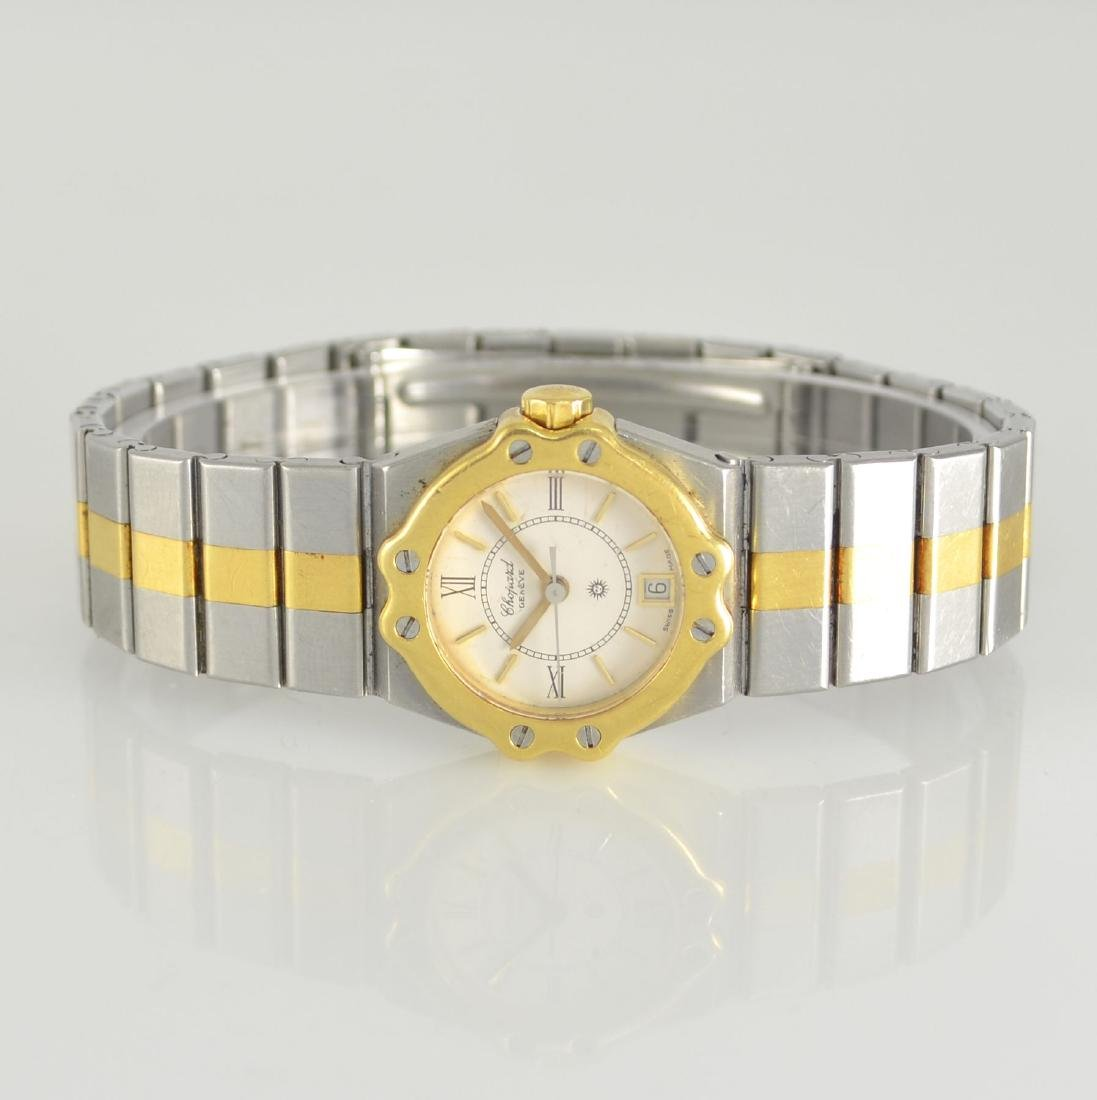 CHOPARD ladies wristwatch model St. Moritz